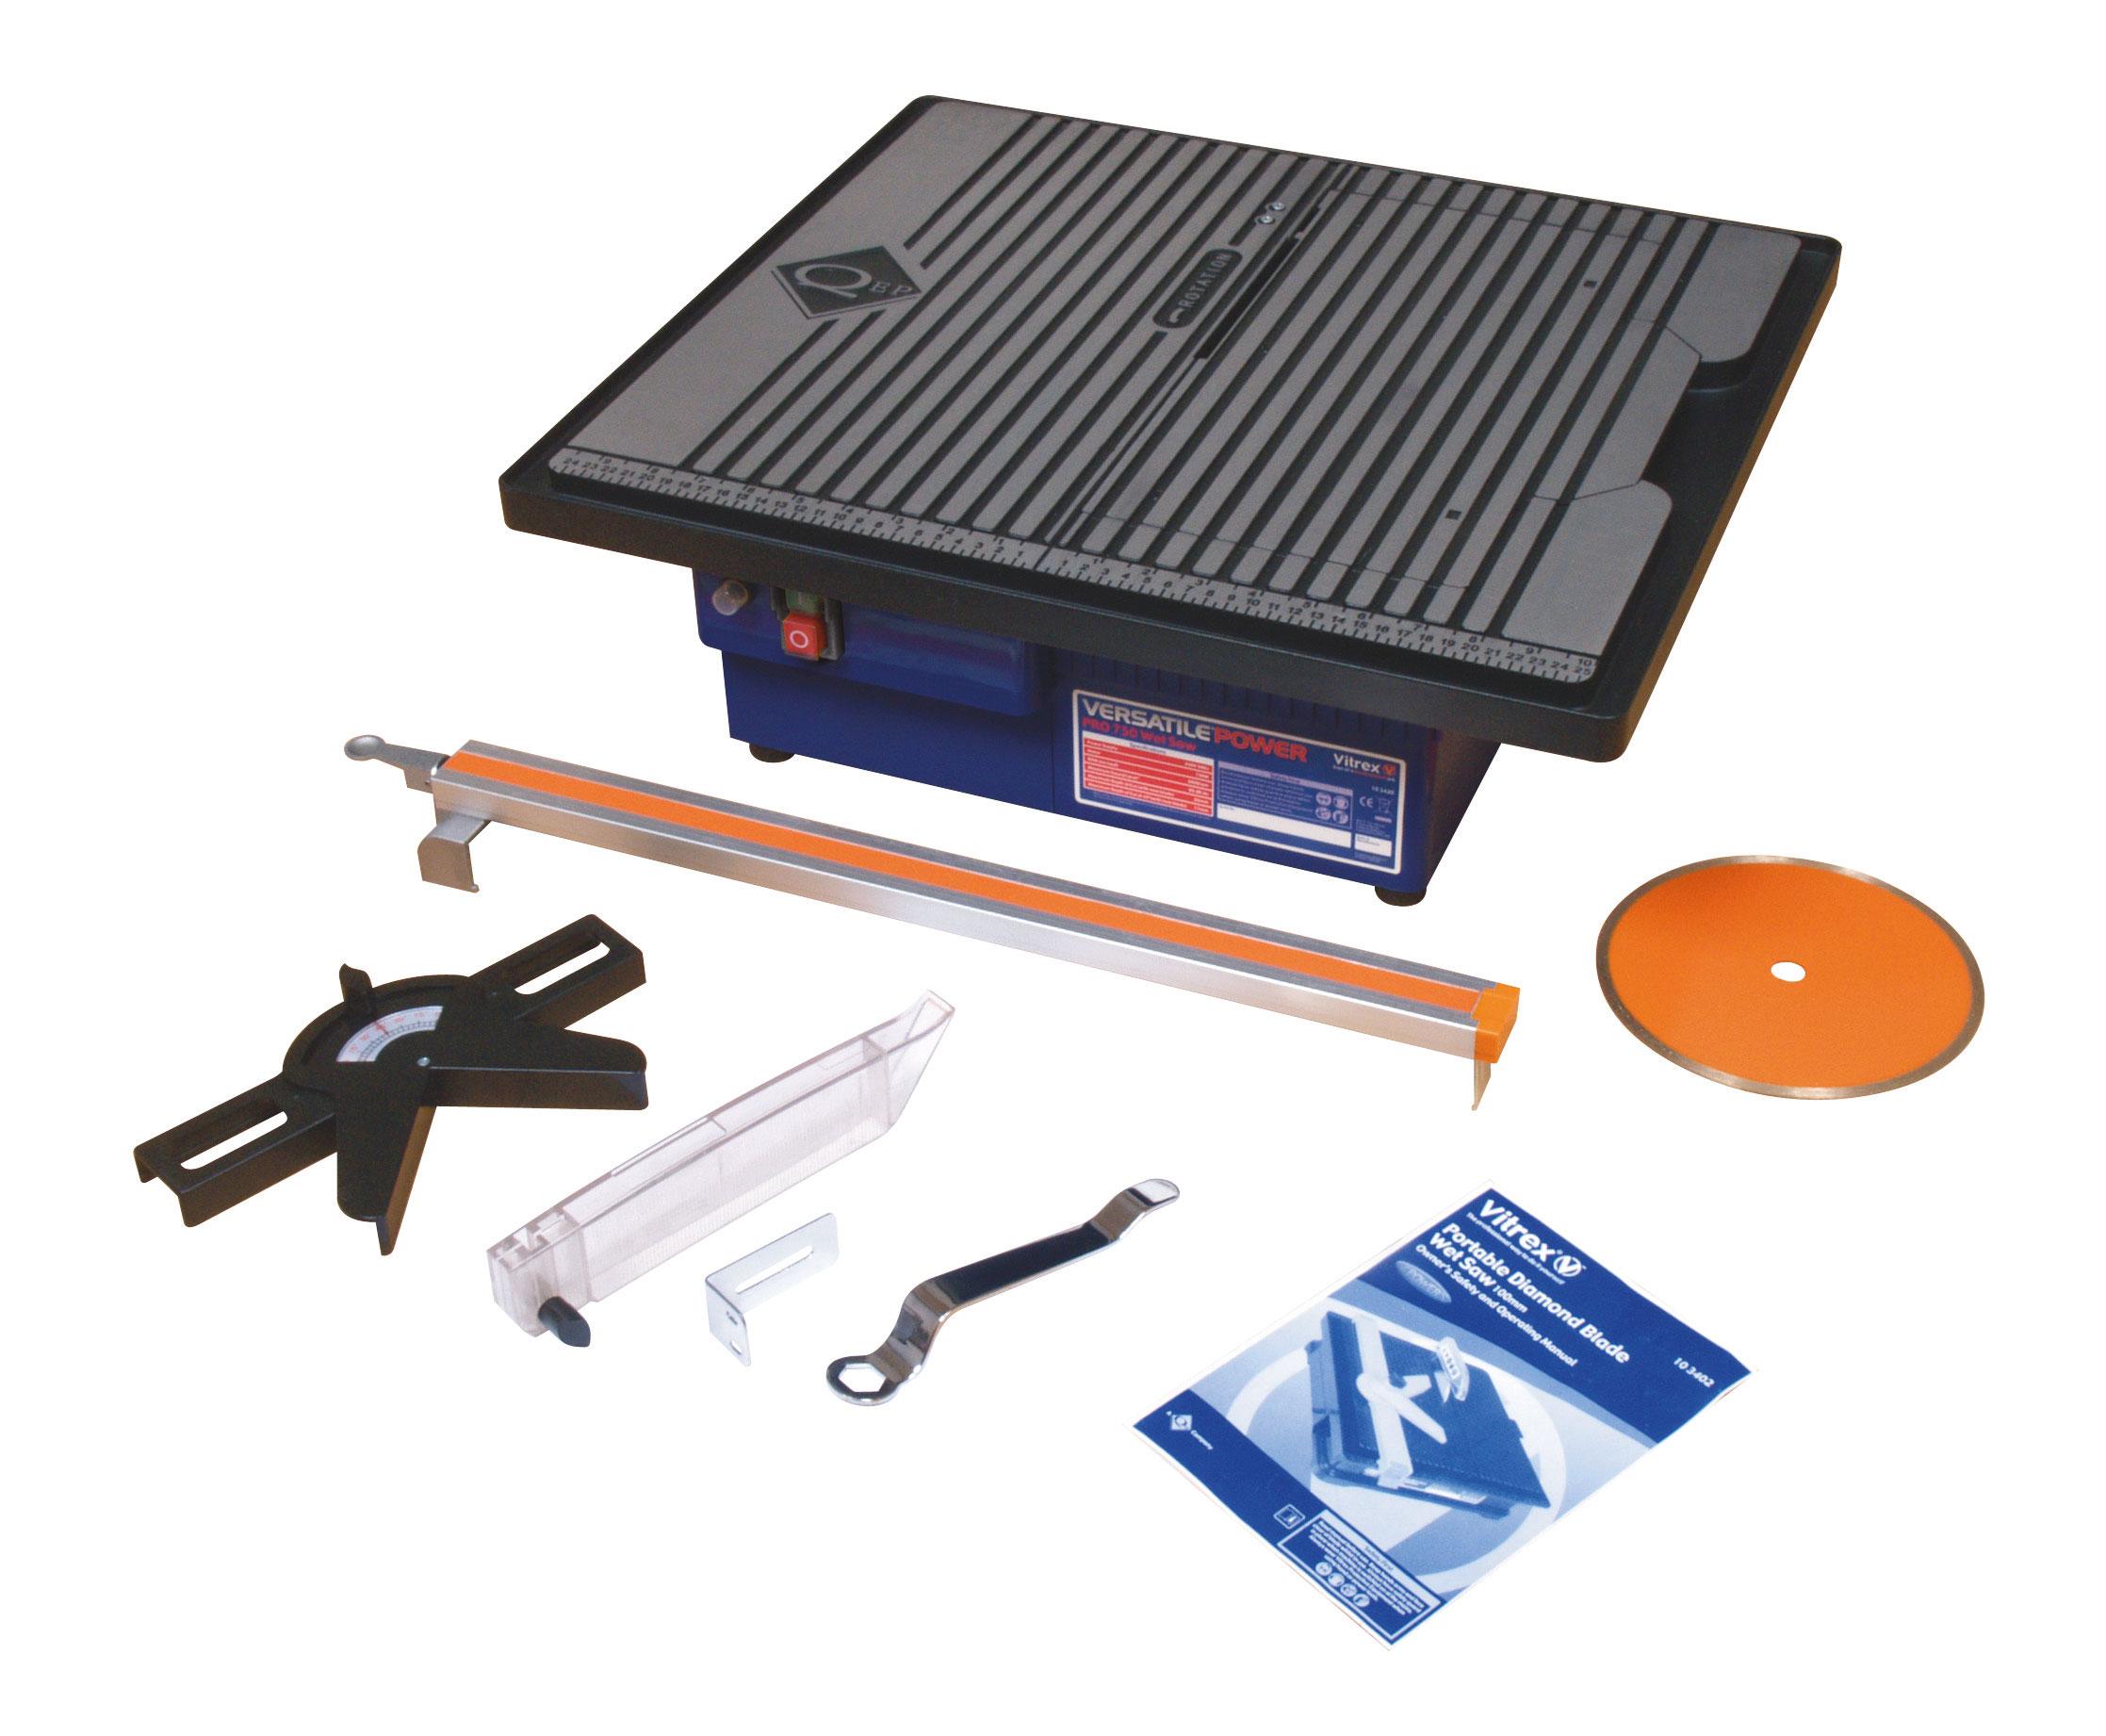 Versatile Power Pro 750 Wet Saw